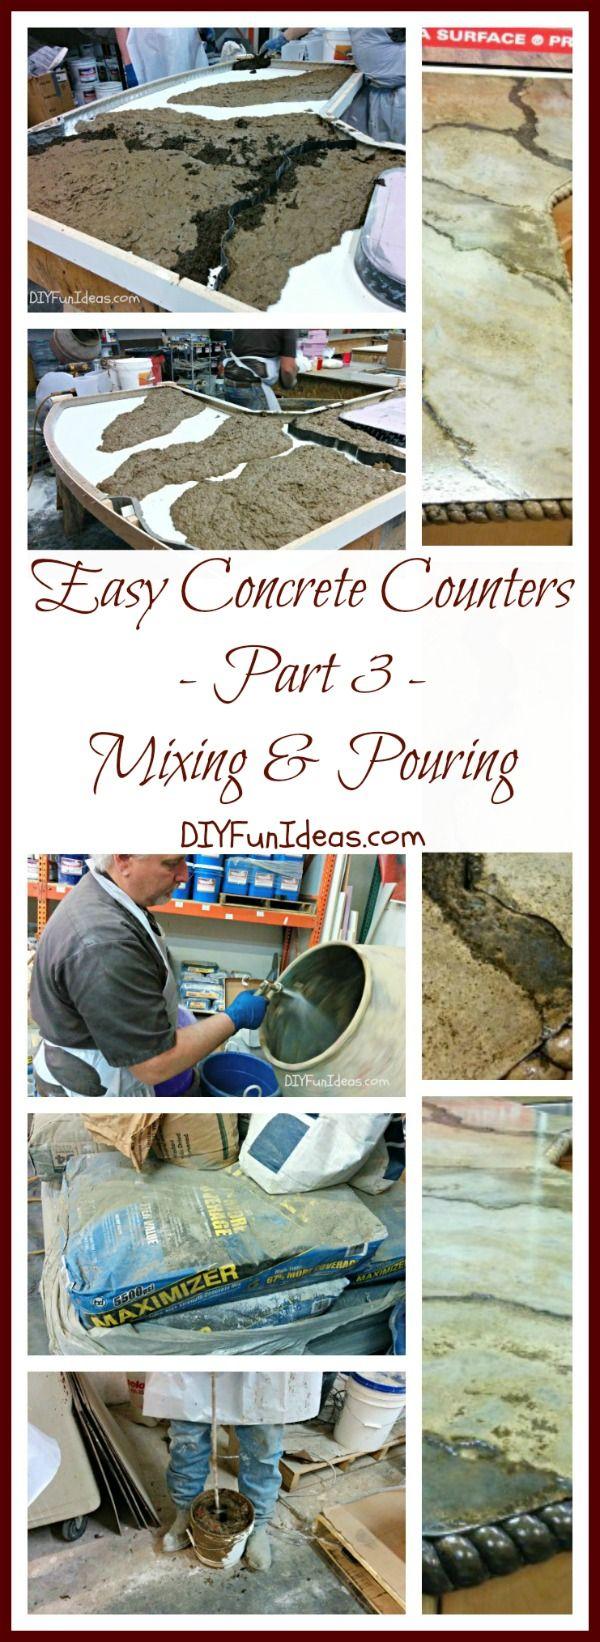 EASY TUTORIAL TO CREATE AMAZING DIY CONCRETE COUNTERTOPS - PART 3